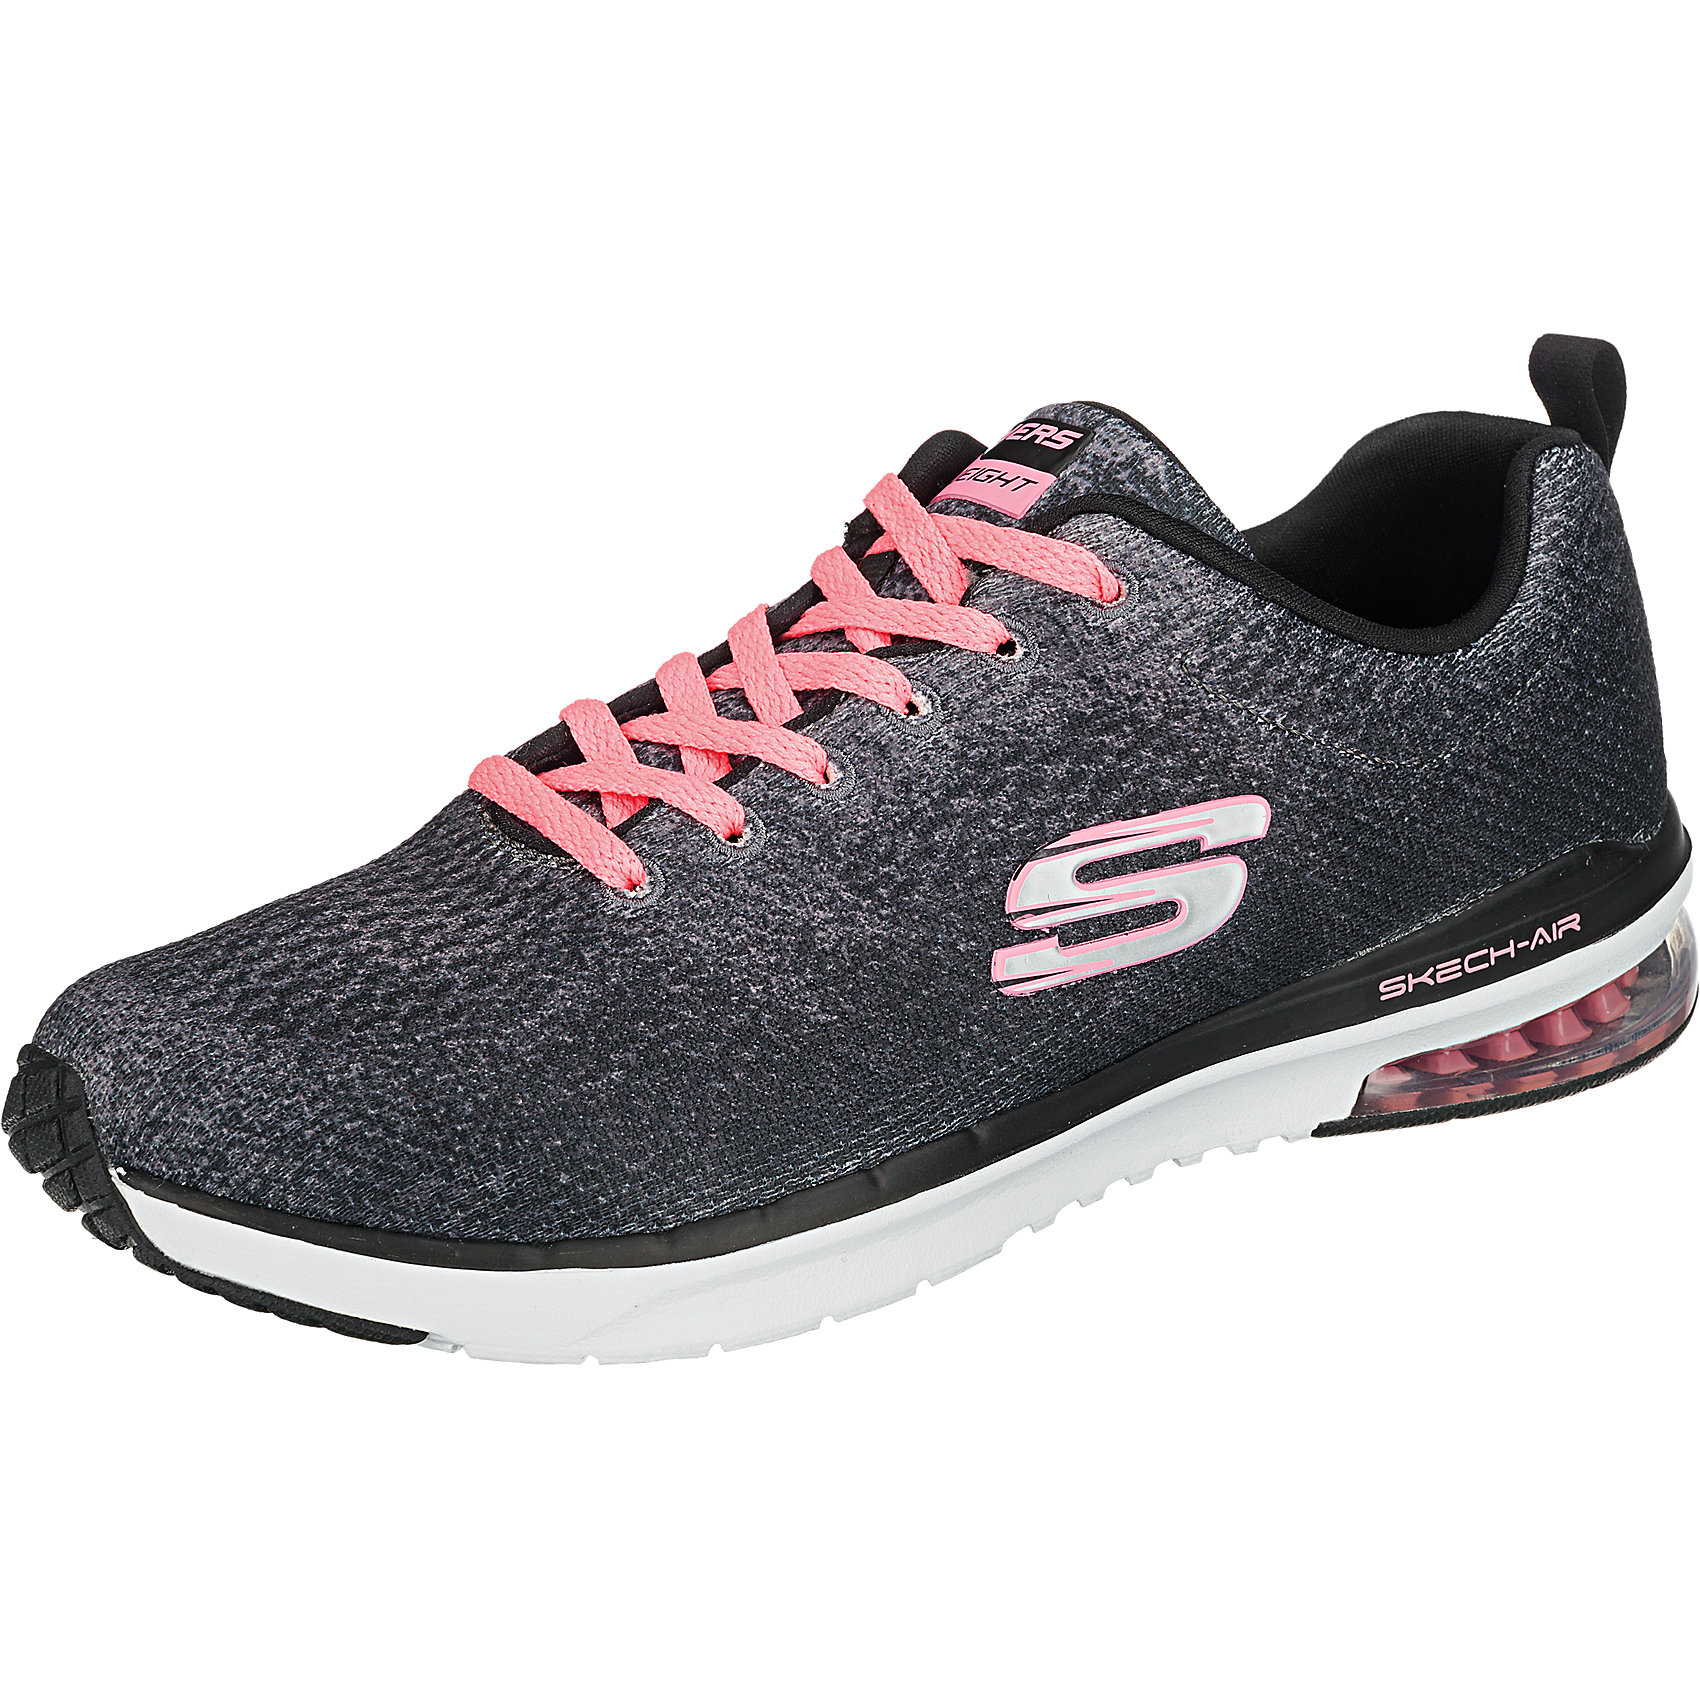 Details zu Neu SKECHERS Skech Air Infinity Modern Chic Sneakers schwarz 5772288